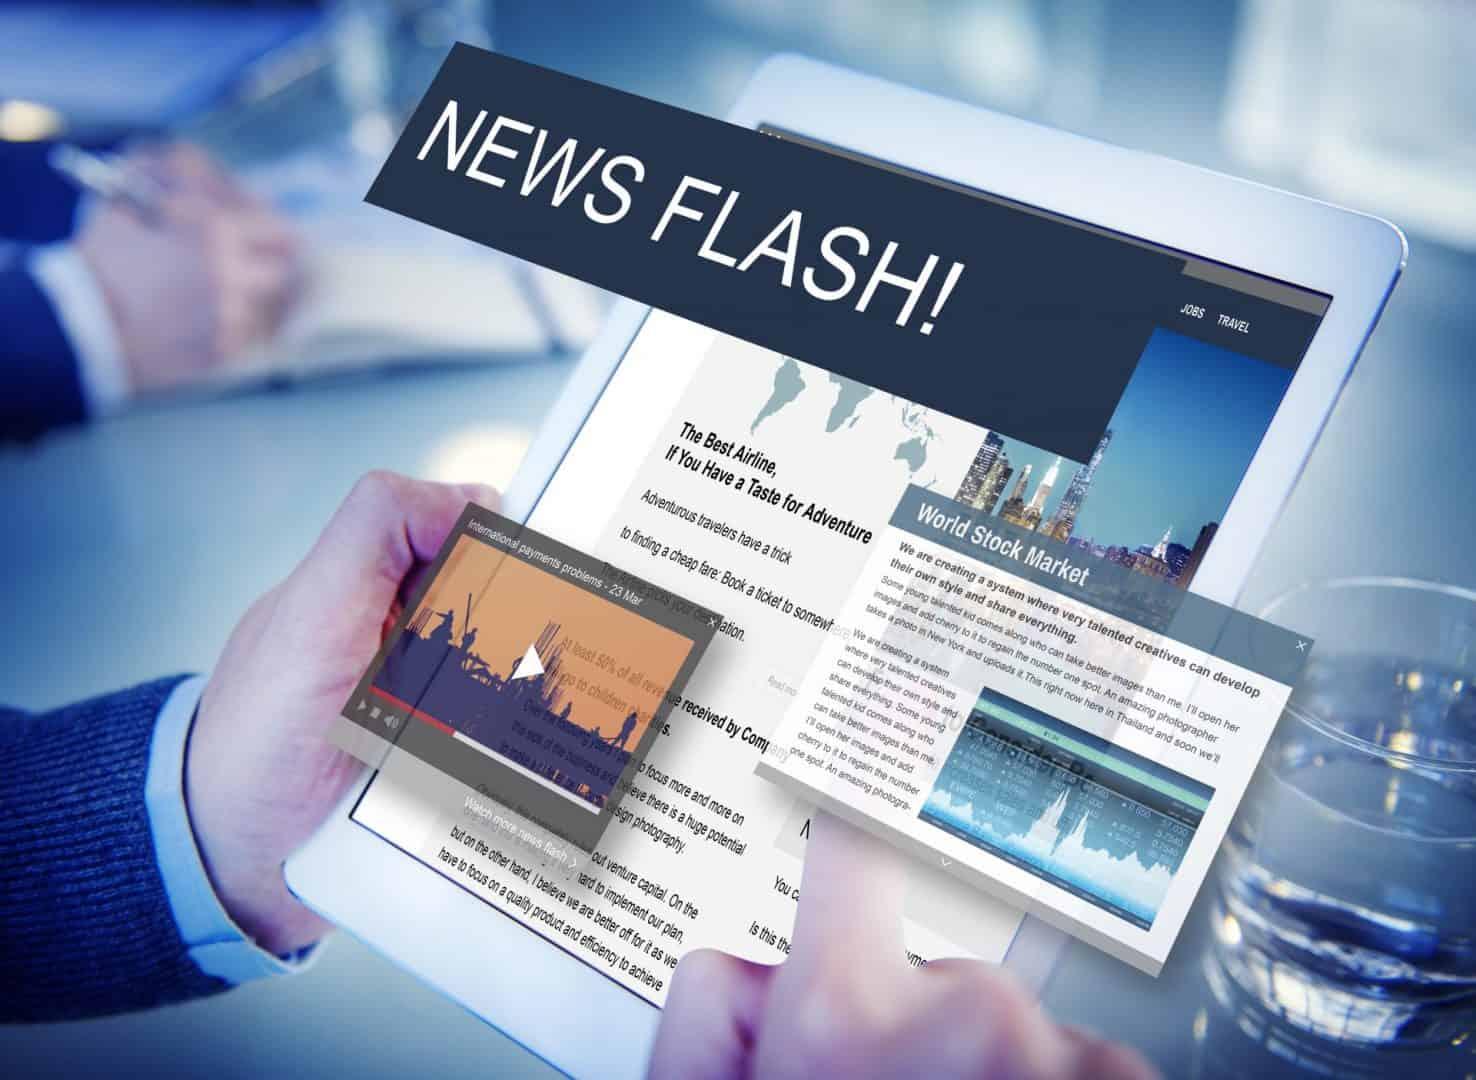 Henderson News Flash